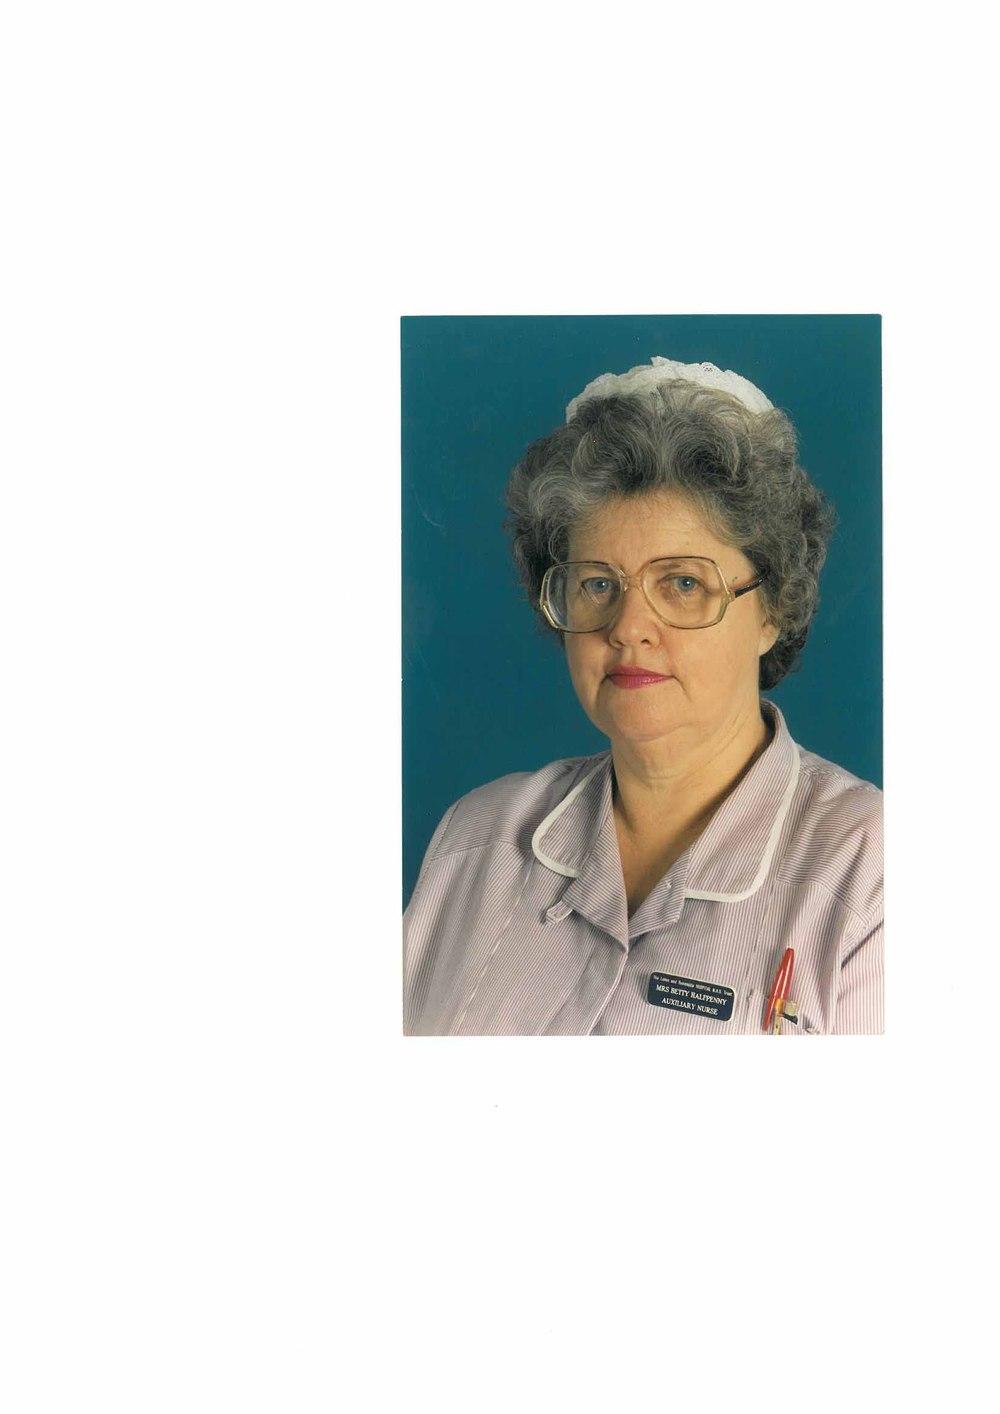 Betty Halfpenny SKMBT_C28013013018120.jpg